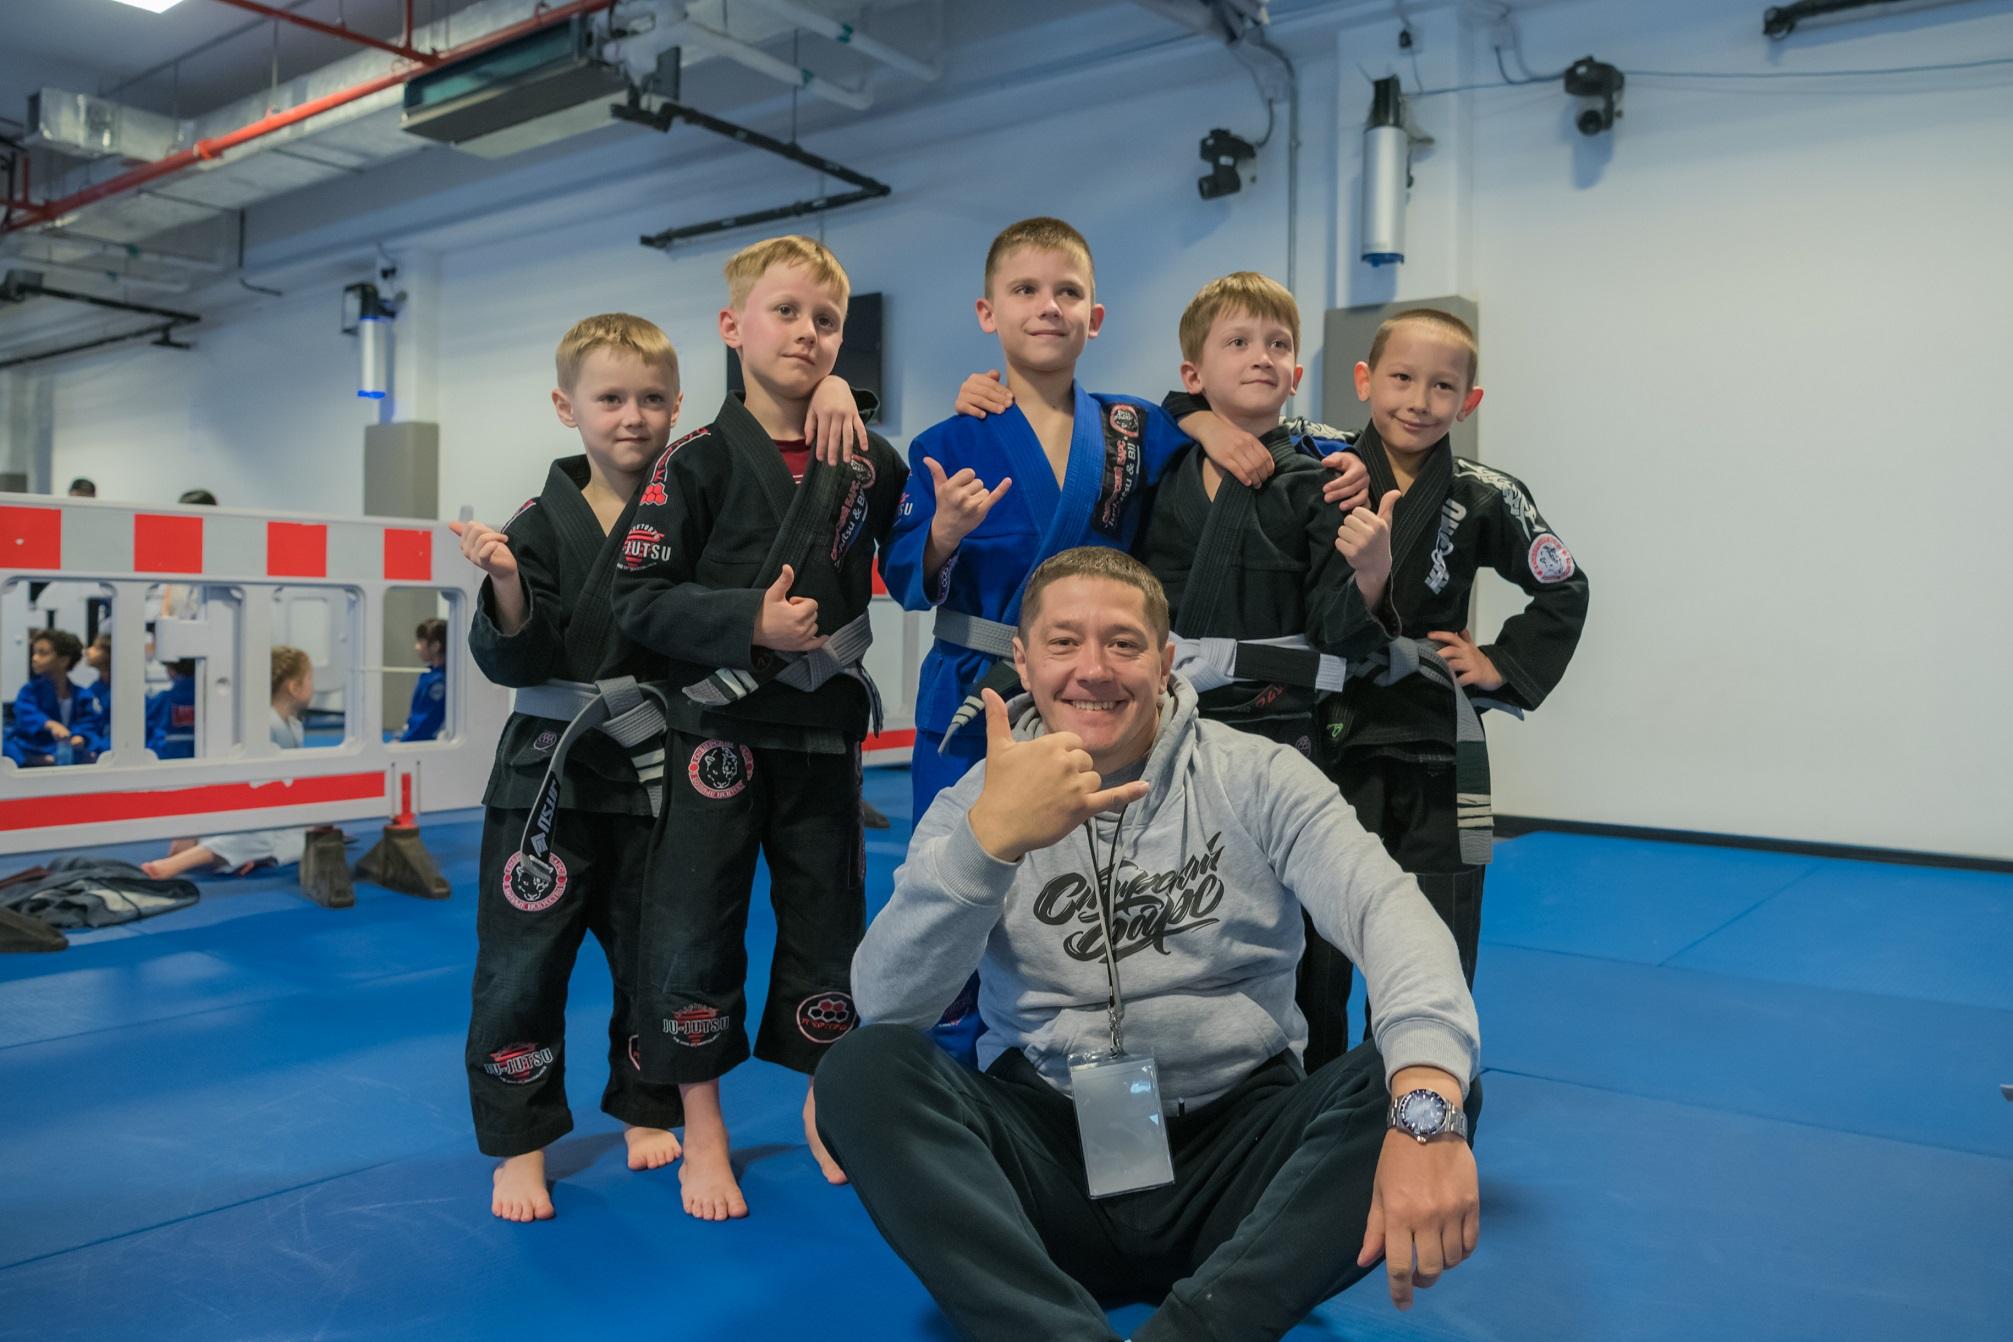 abu dhabi world professional jiu-jitsu championship shows jiu-jitsu is a sport for all 8.jpg